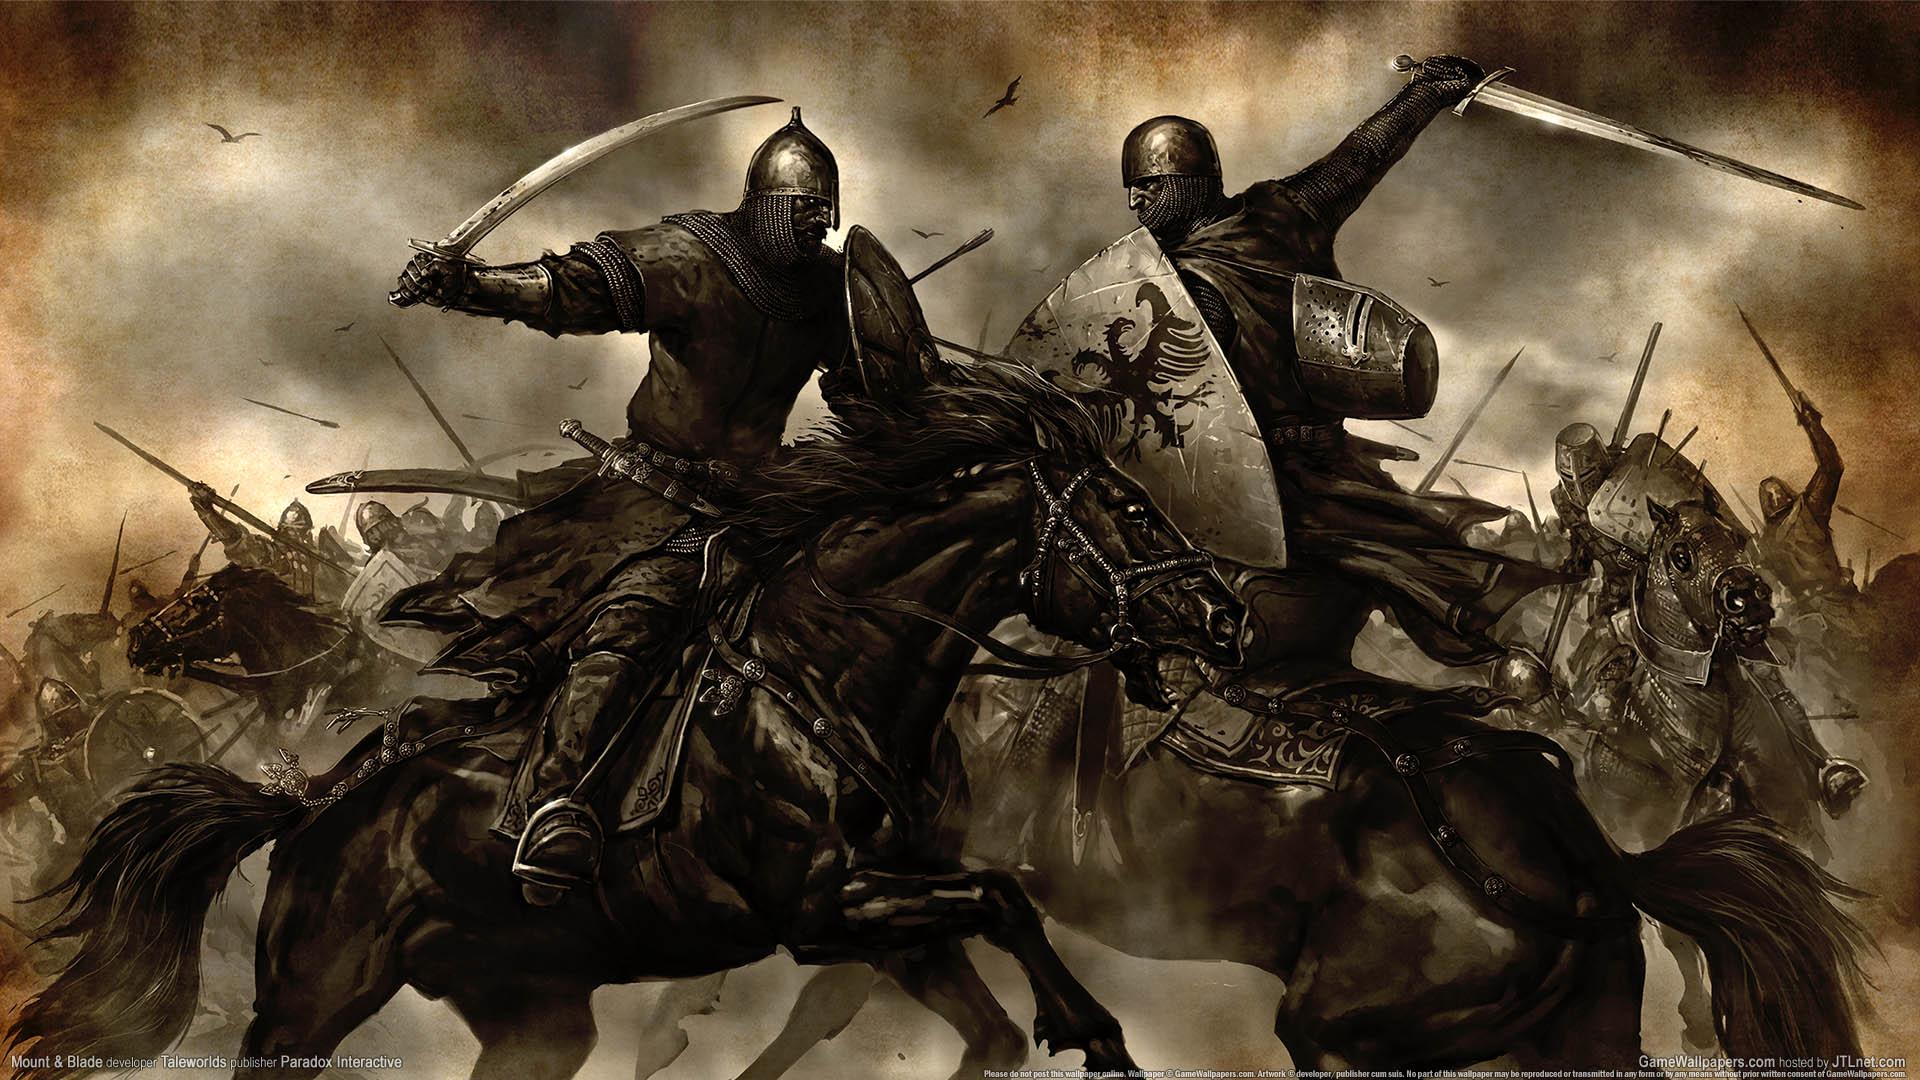 Mount & Blade wallpaper 01 1920x1080